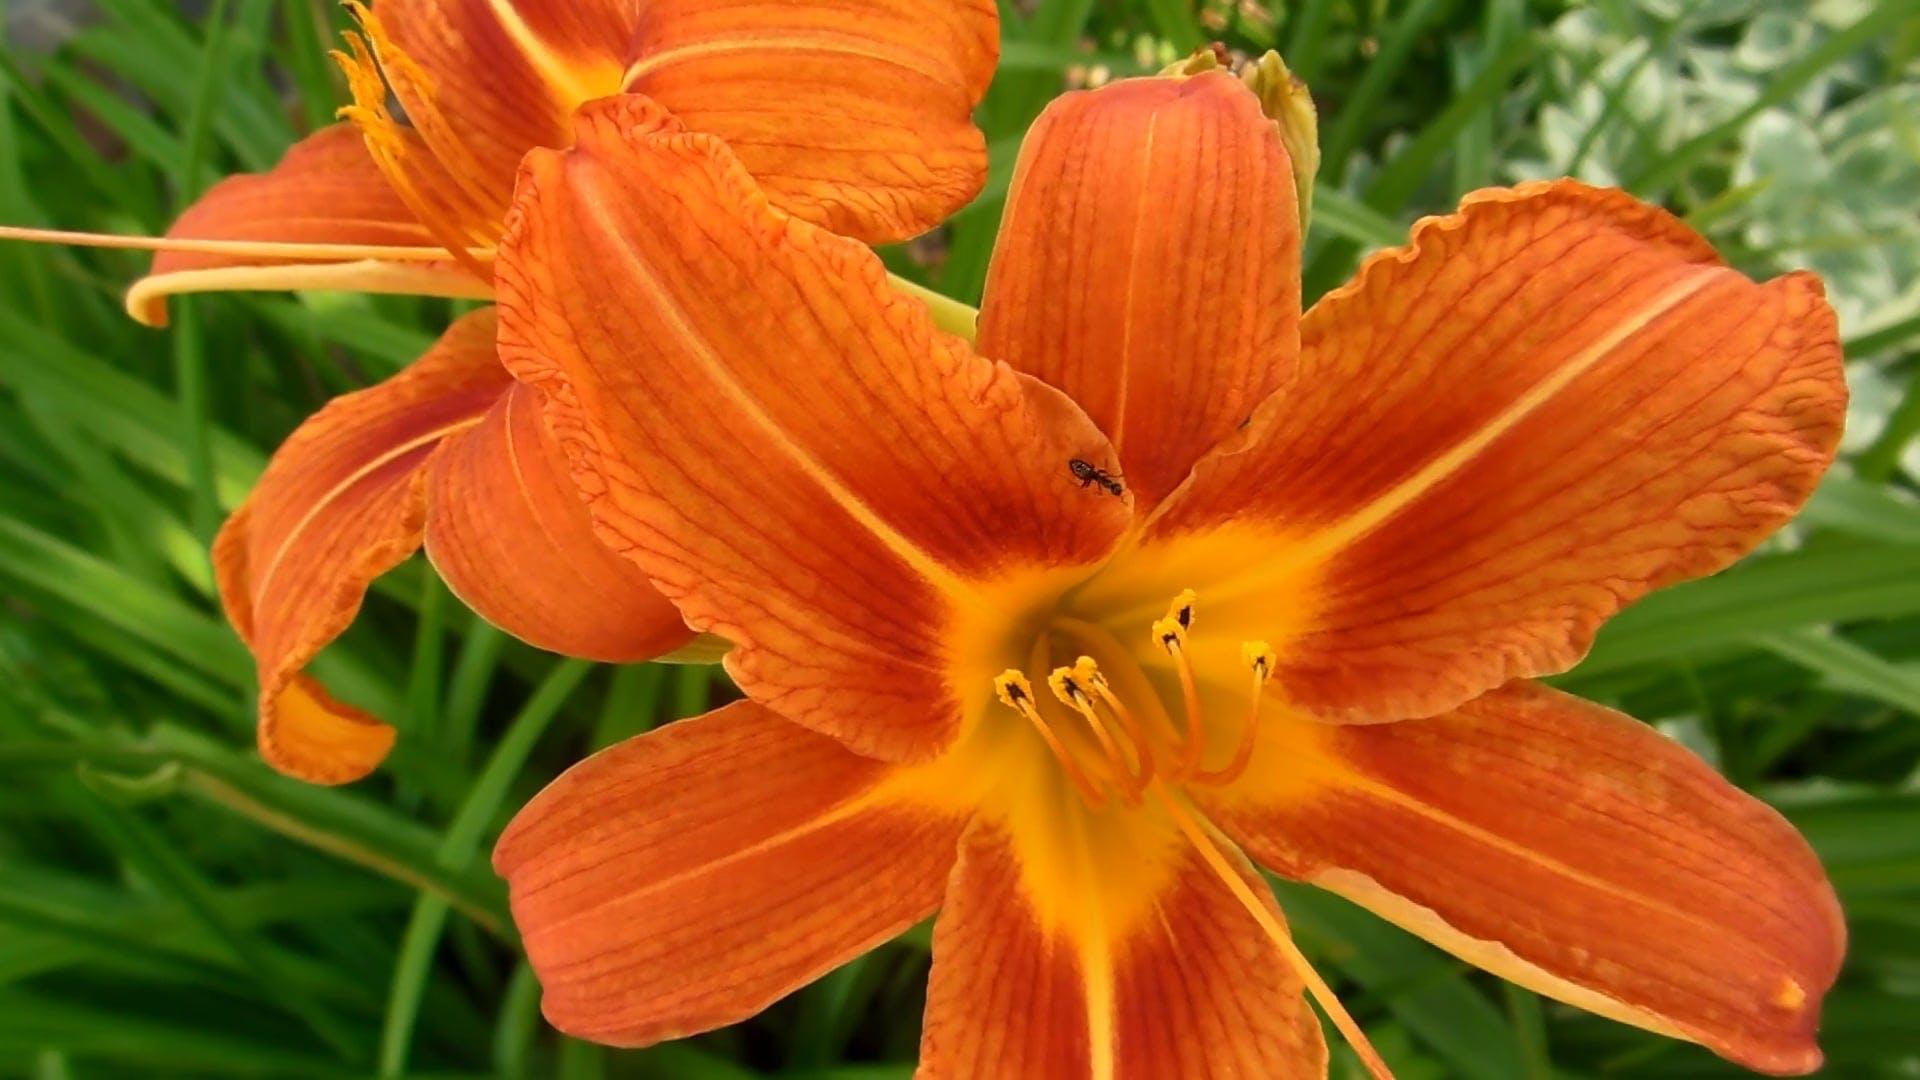 Close-up Video Of Red Orange Flower